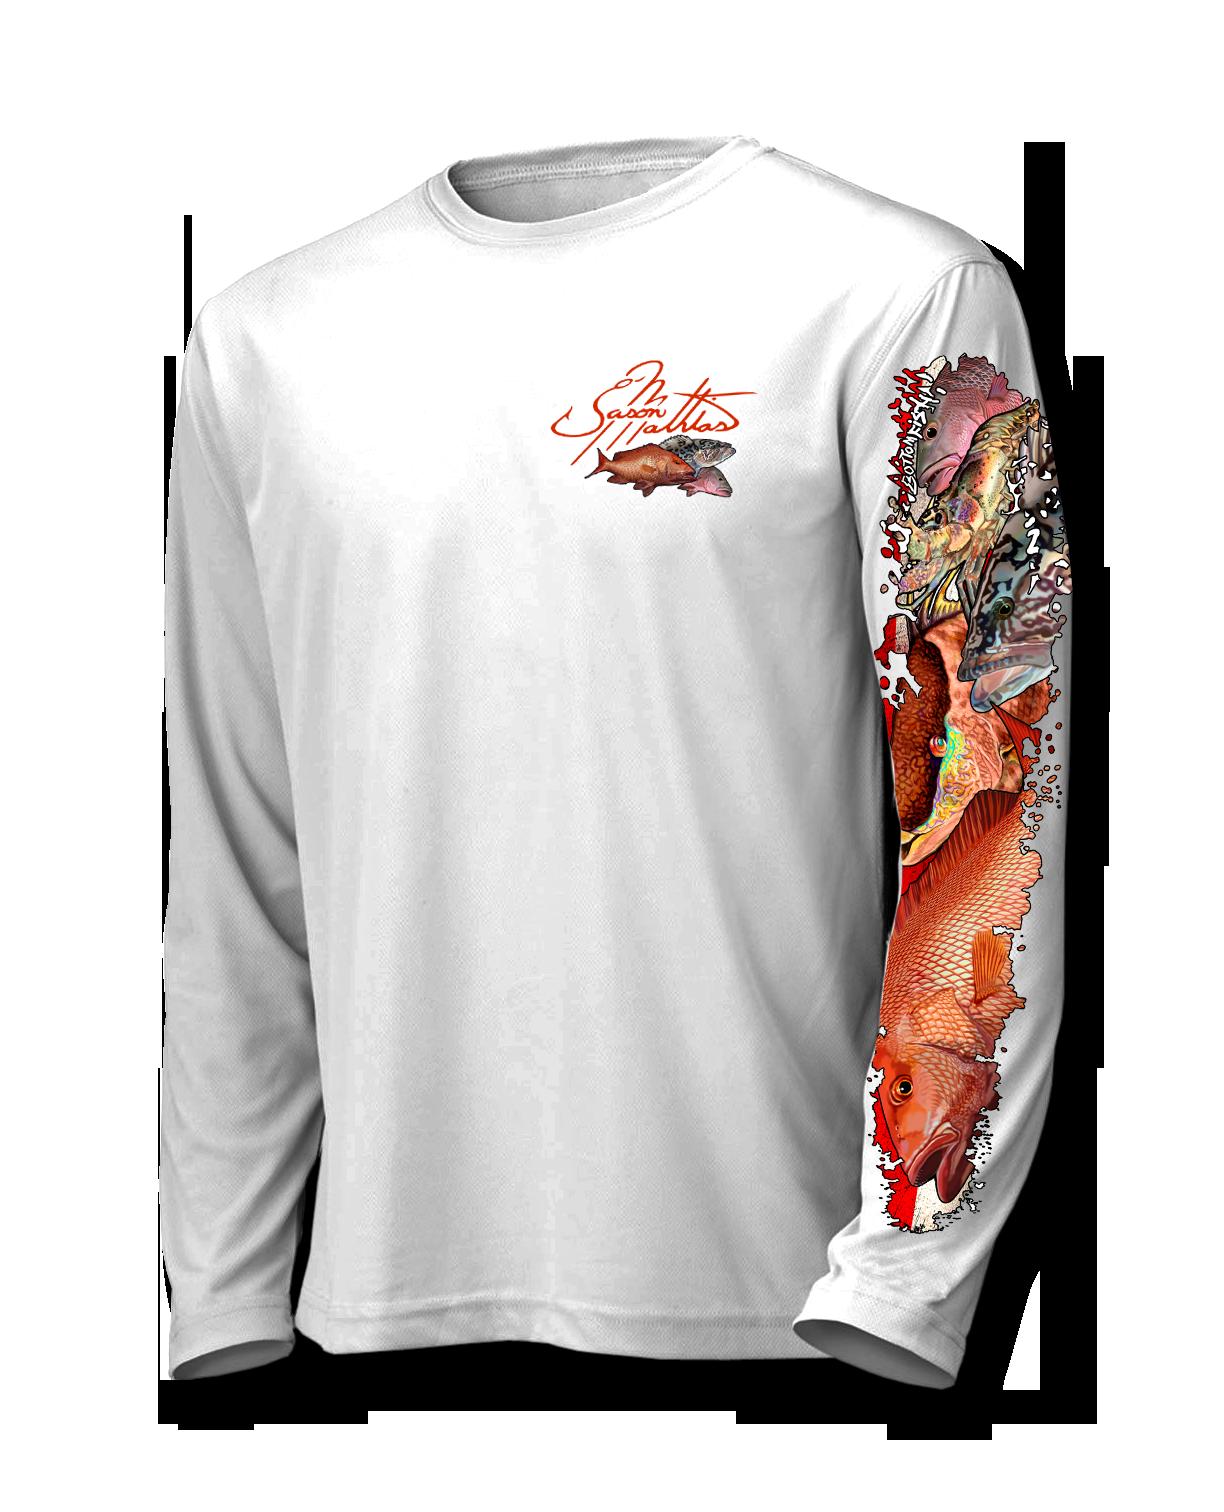 bottomfish-slam-shirt-front-jason-mathias.png